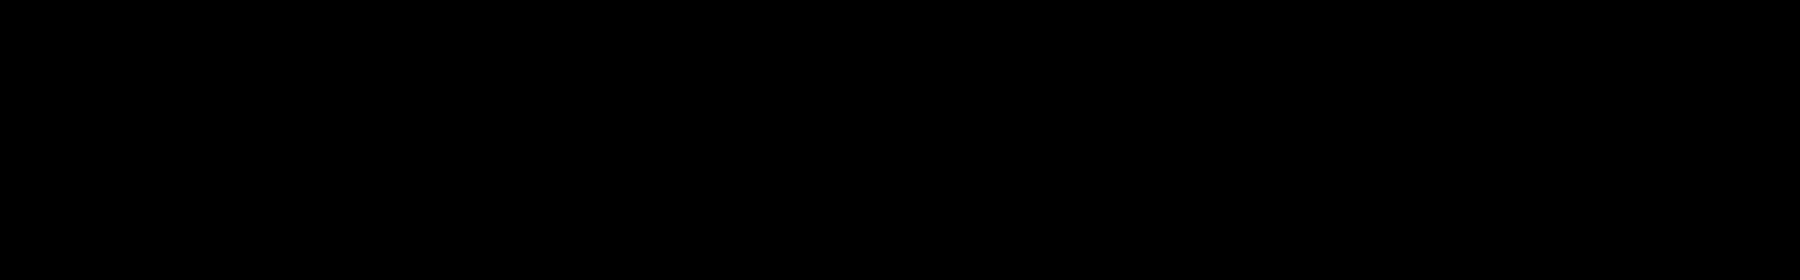 ARPIX Trance Midi Pack audio waveform